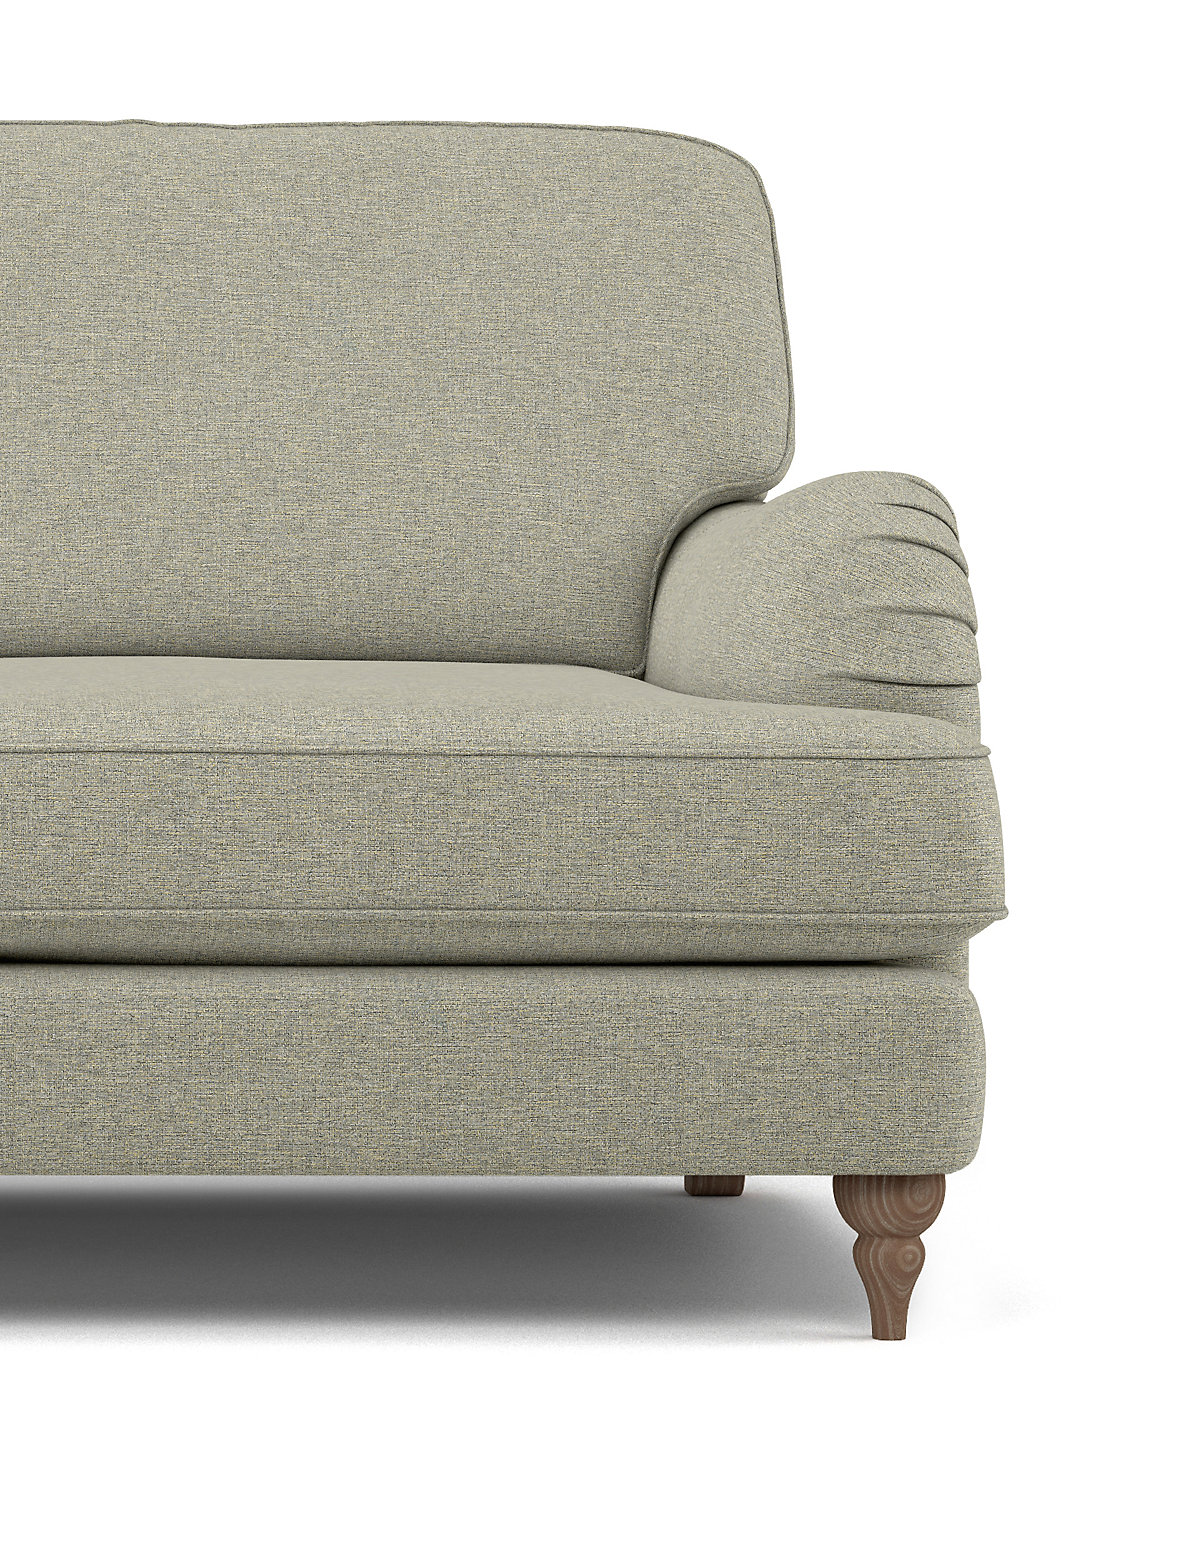 rochester sofa arm caps